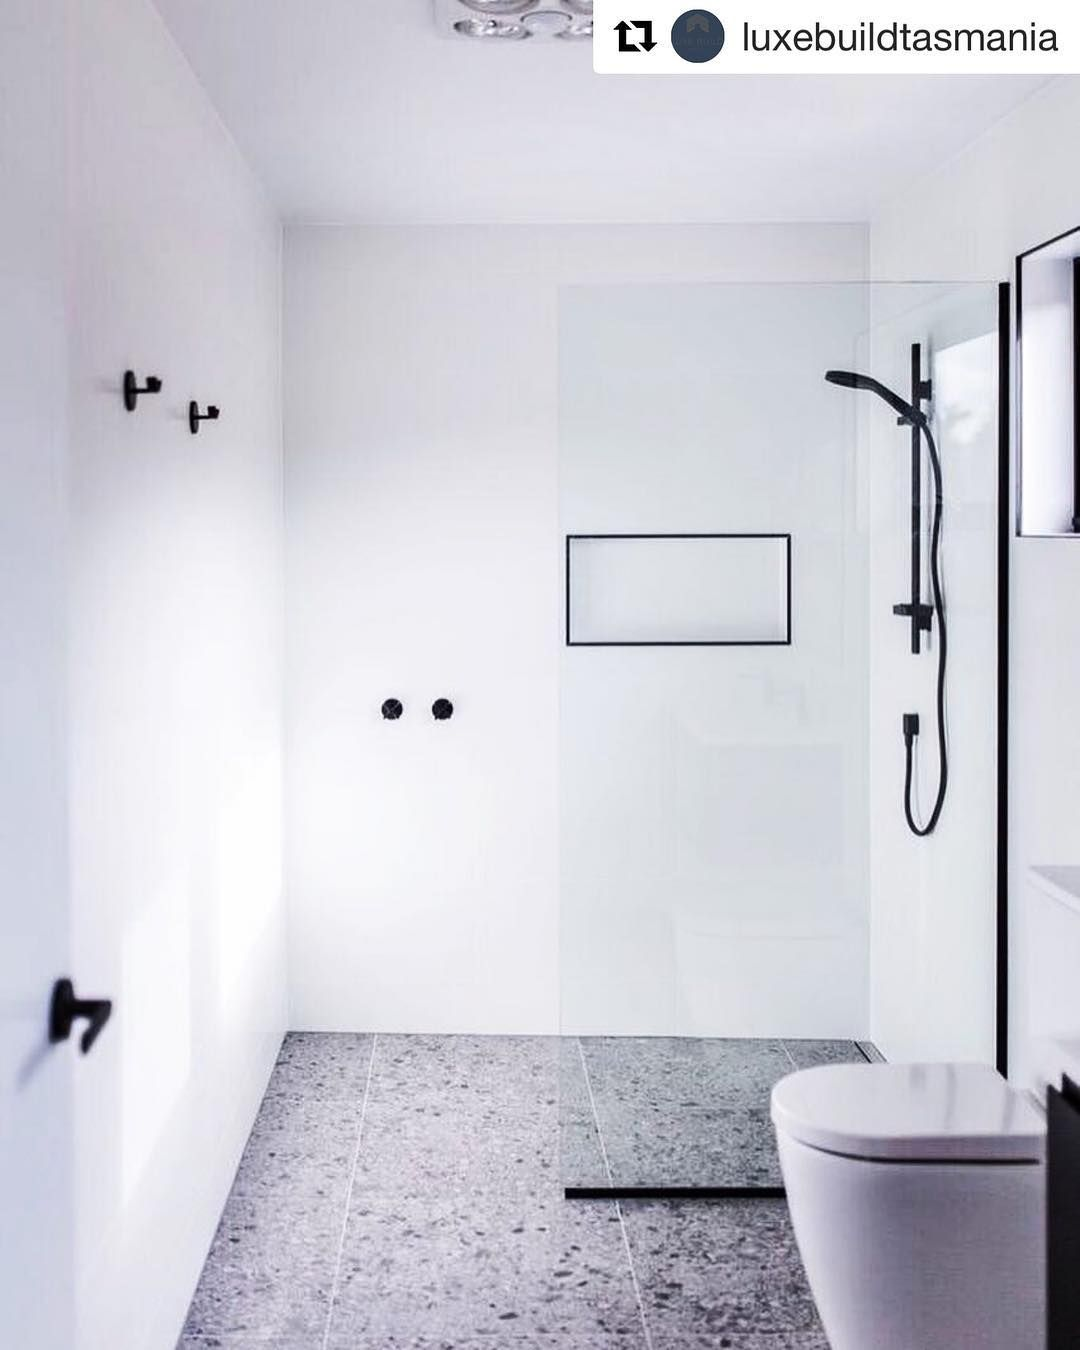 A Beautiful Bathroom By Luxebuildtasmania Using Our Terrazzo Grey Matt 600x600 And Easy White Matt 300x60 Beautiful Bathrooms Bathroom Interior Green Bathroom